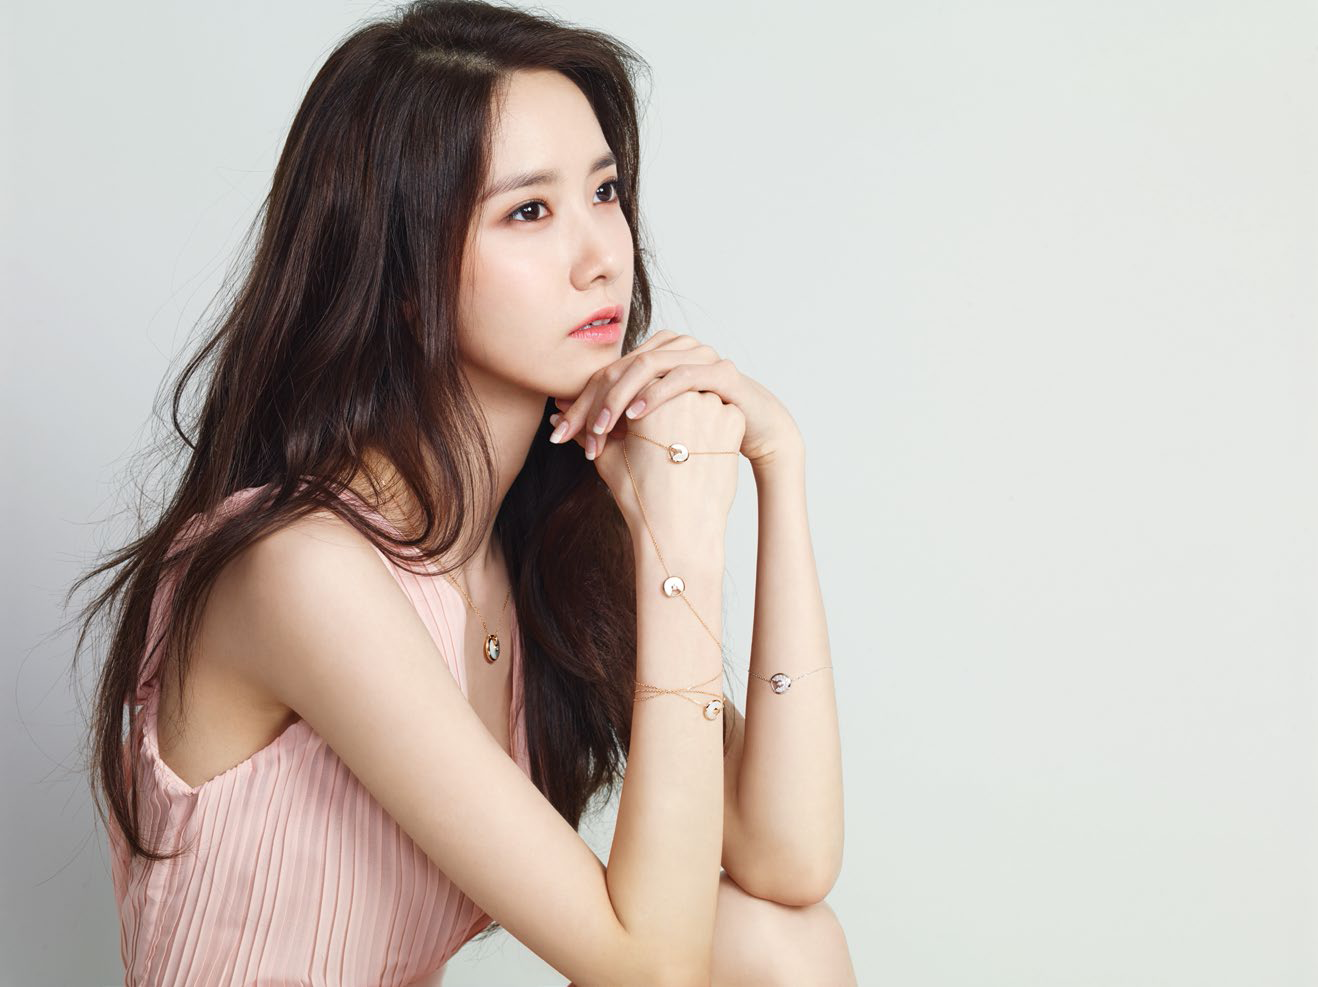 Yoona lee min ho dating latest 2